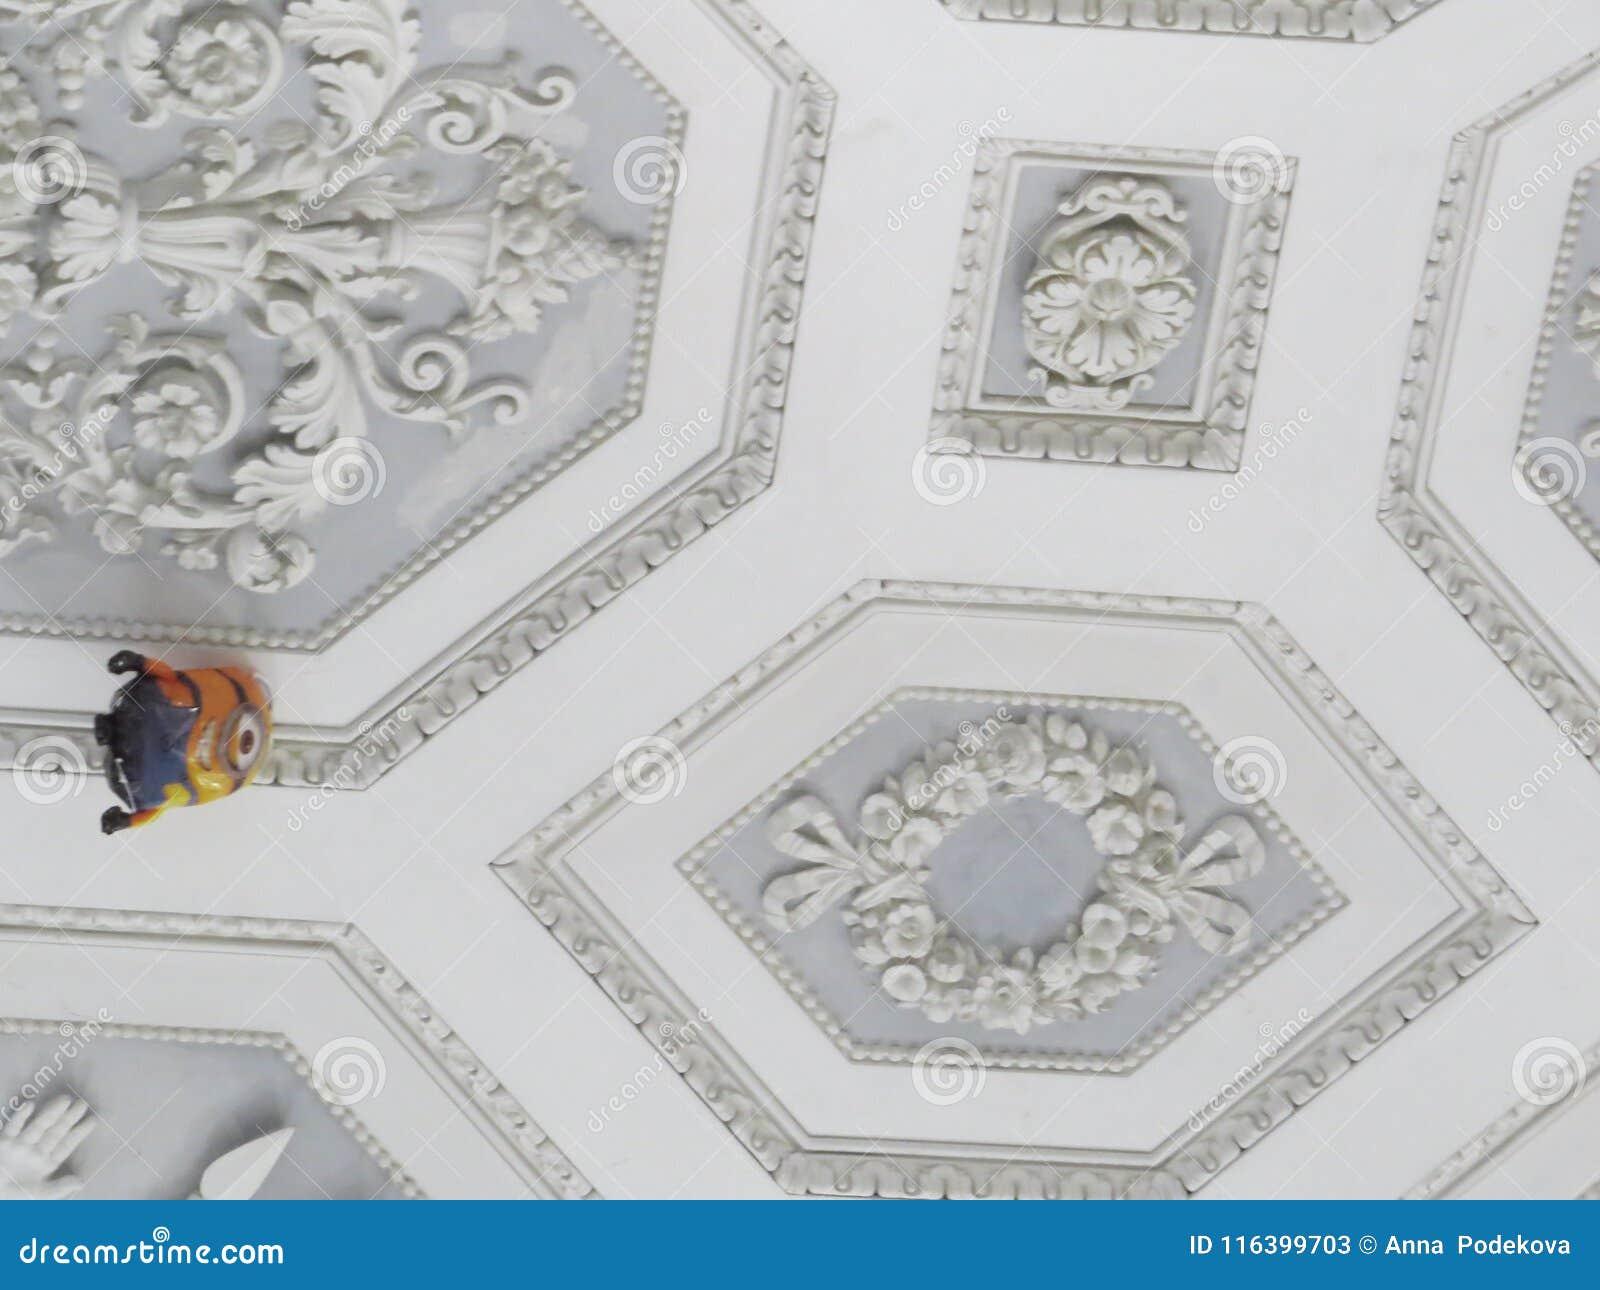 Palazzo Reale - Royal Palace à Naples, Italie